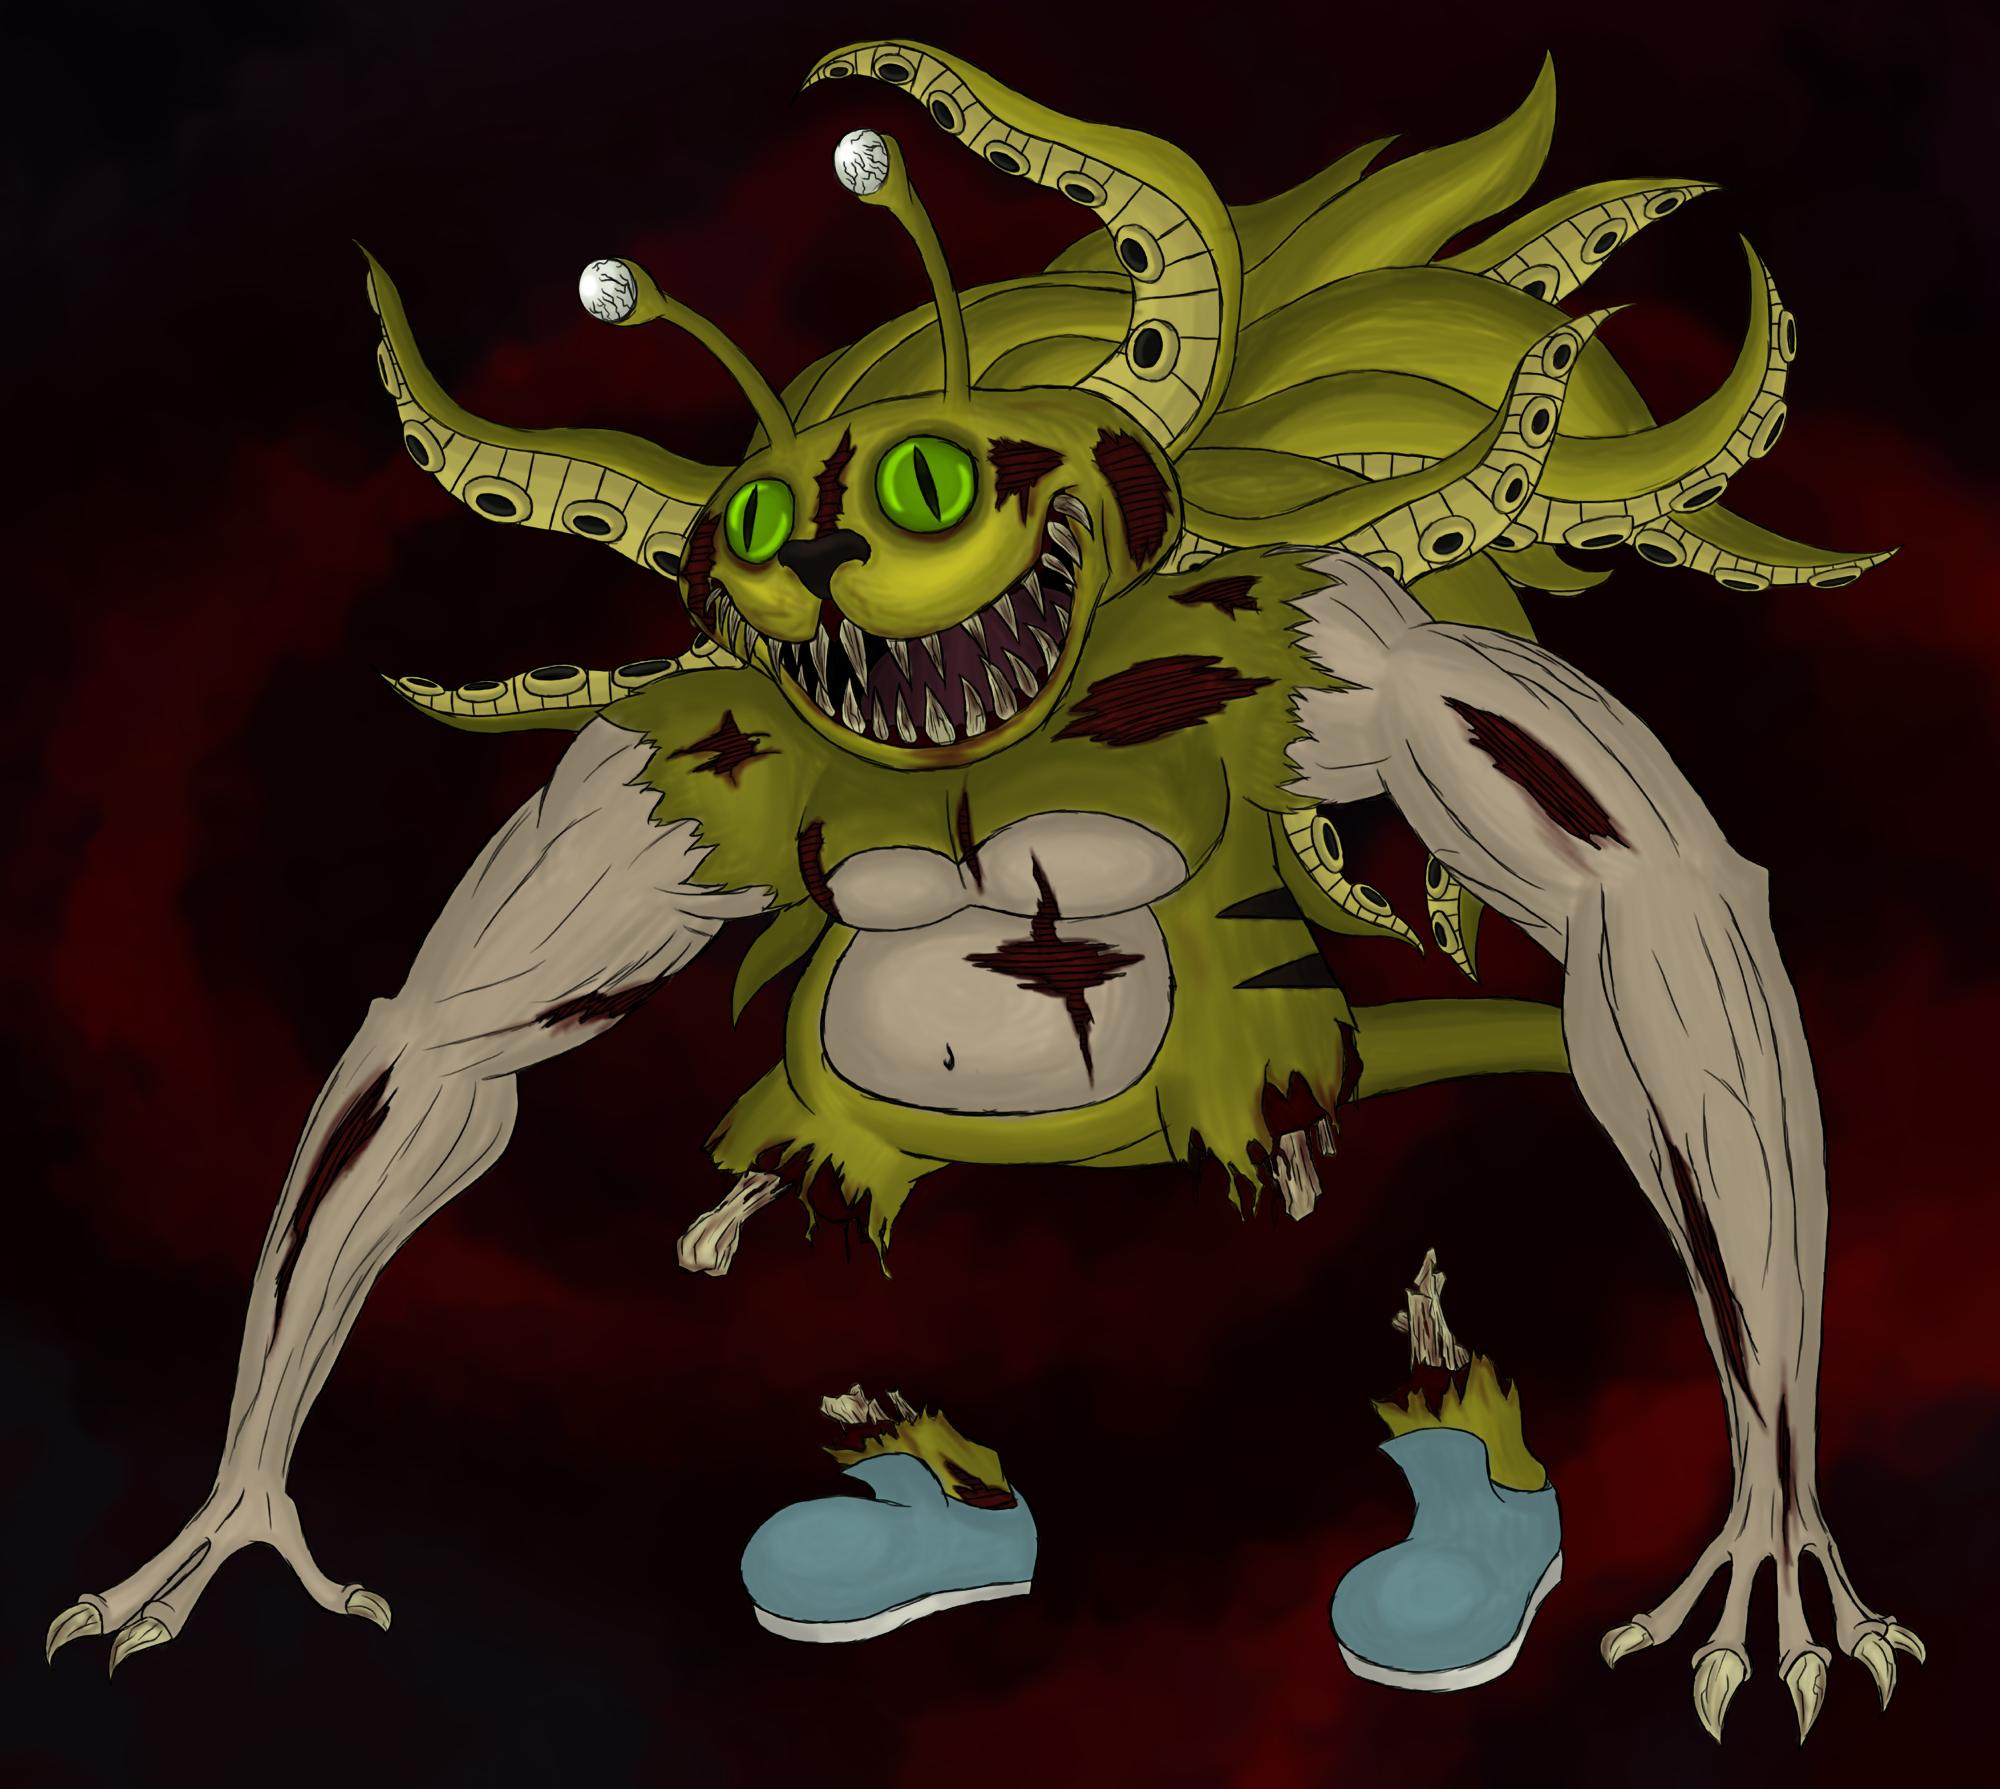 Sonee Abomination